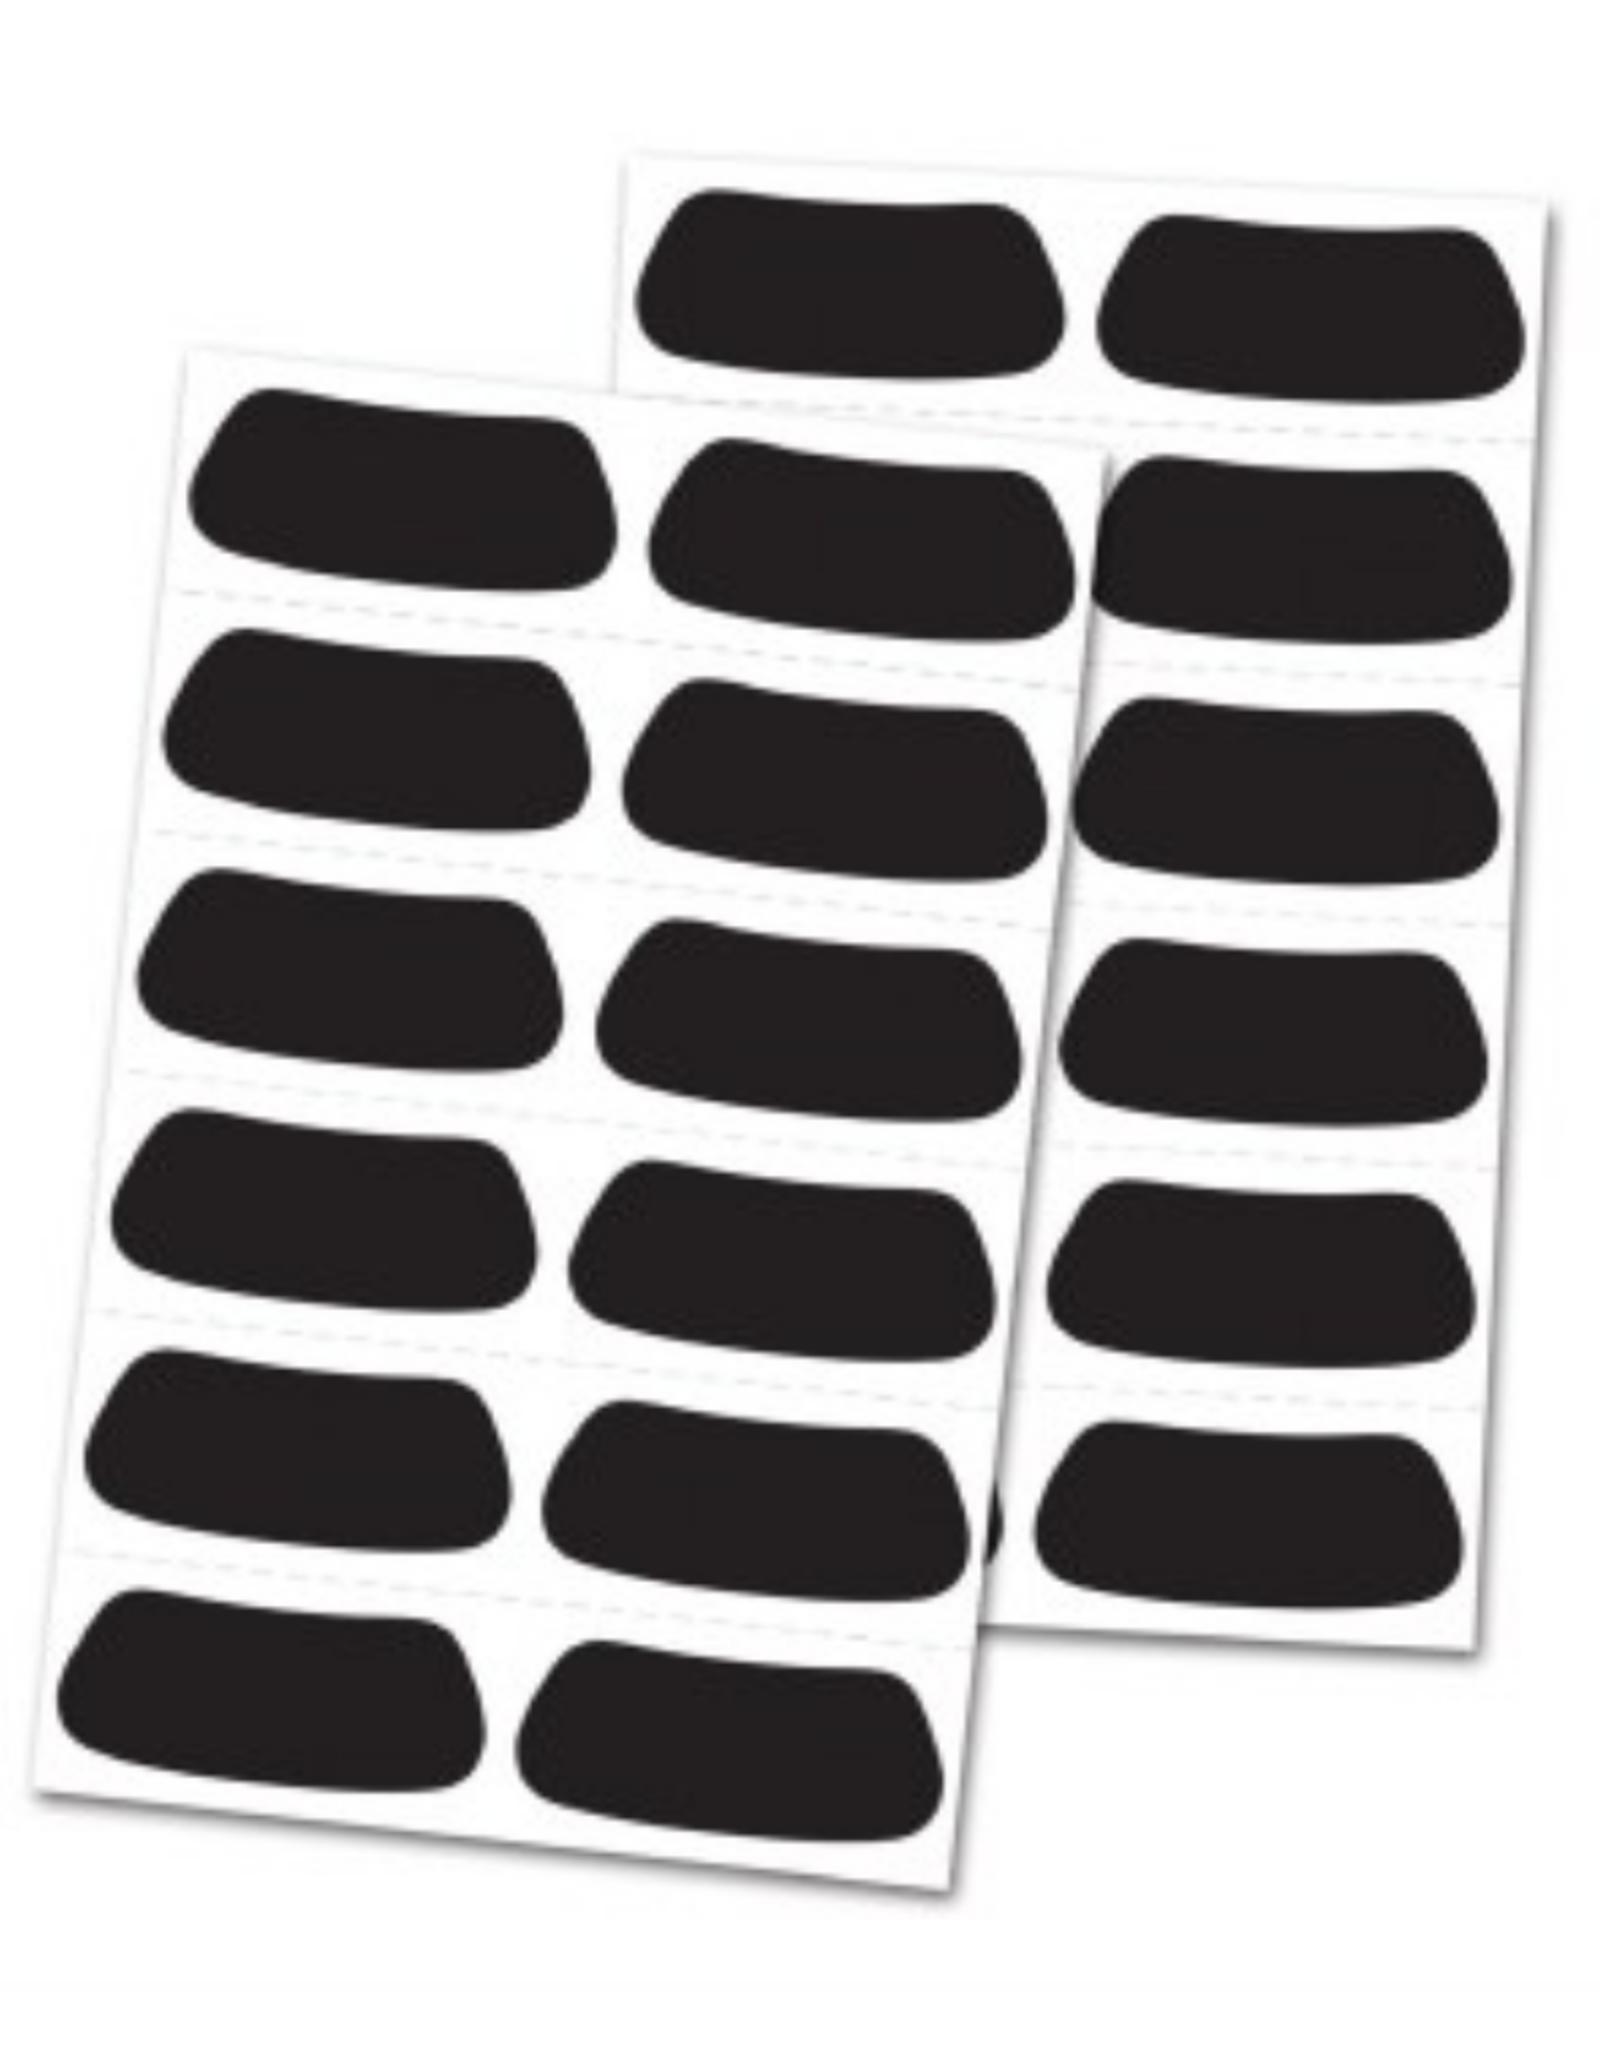 Rawlings Eye Black Stickers